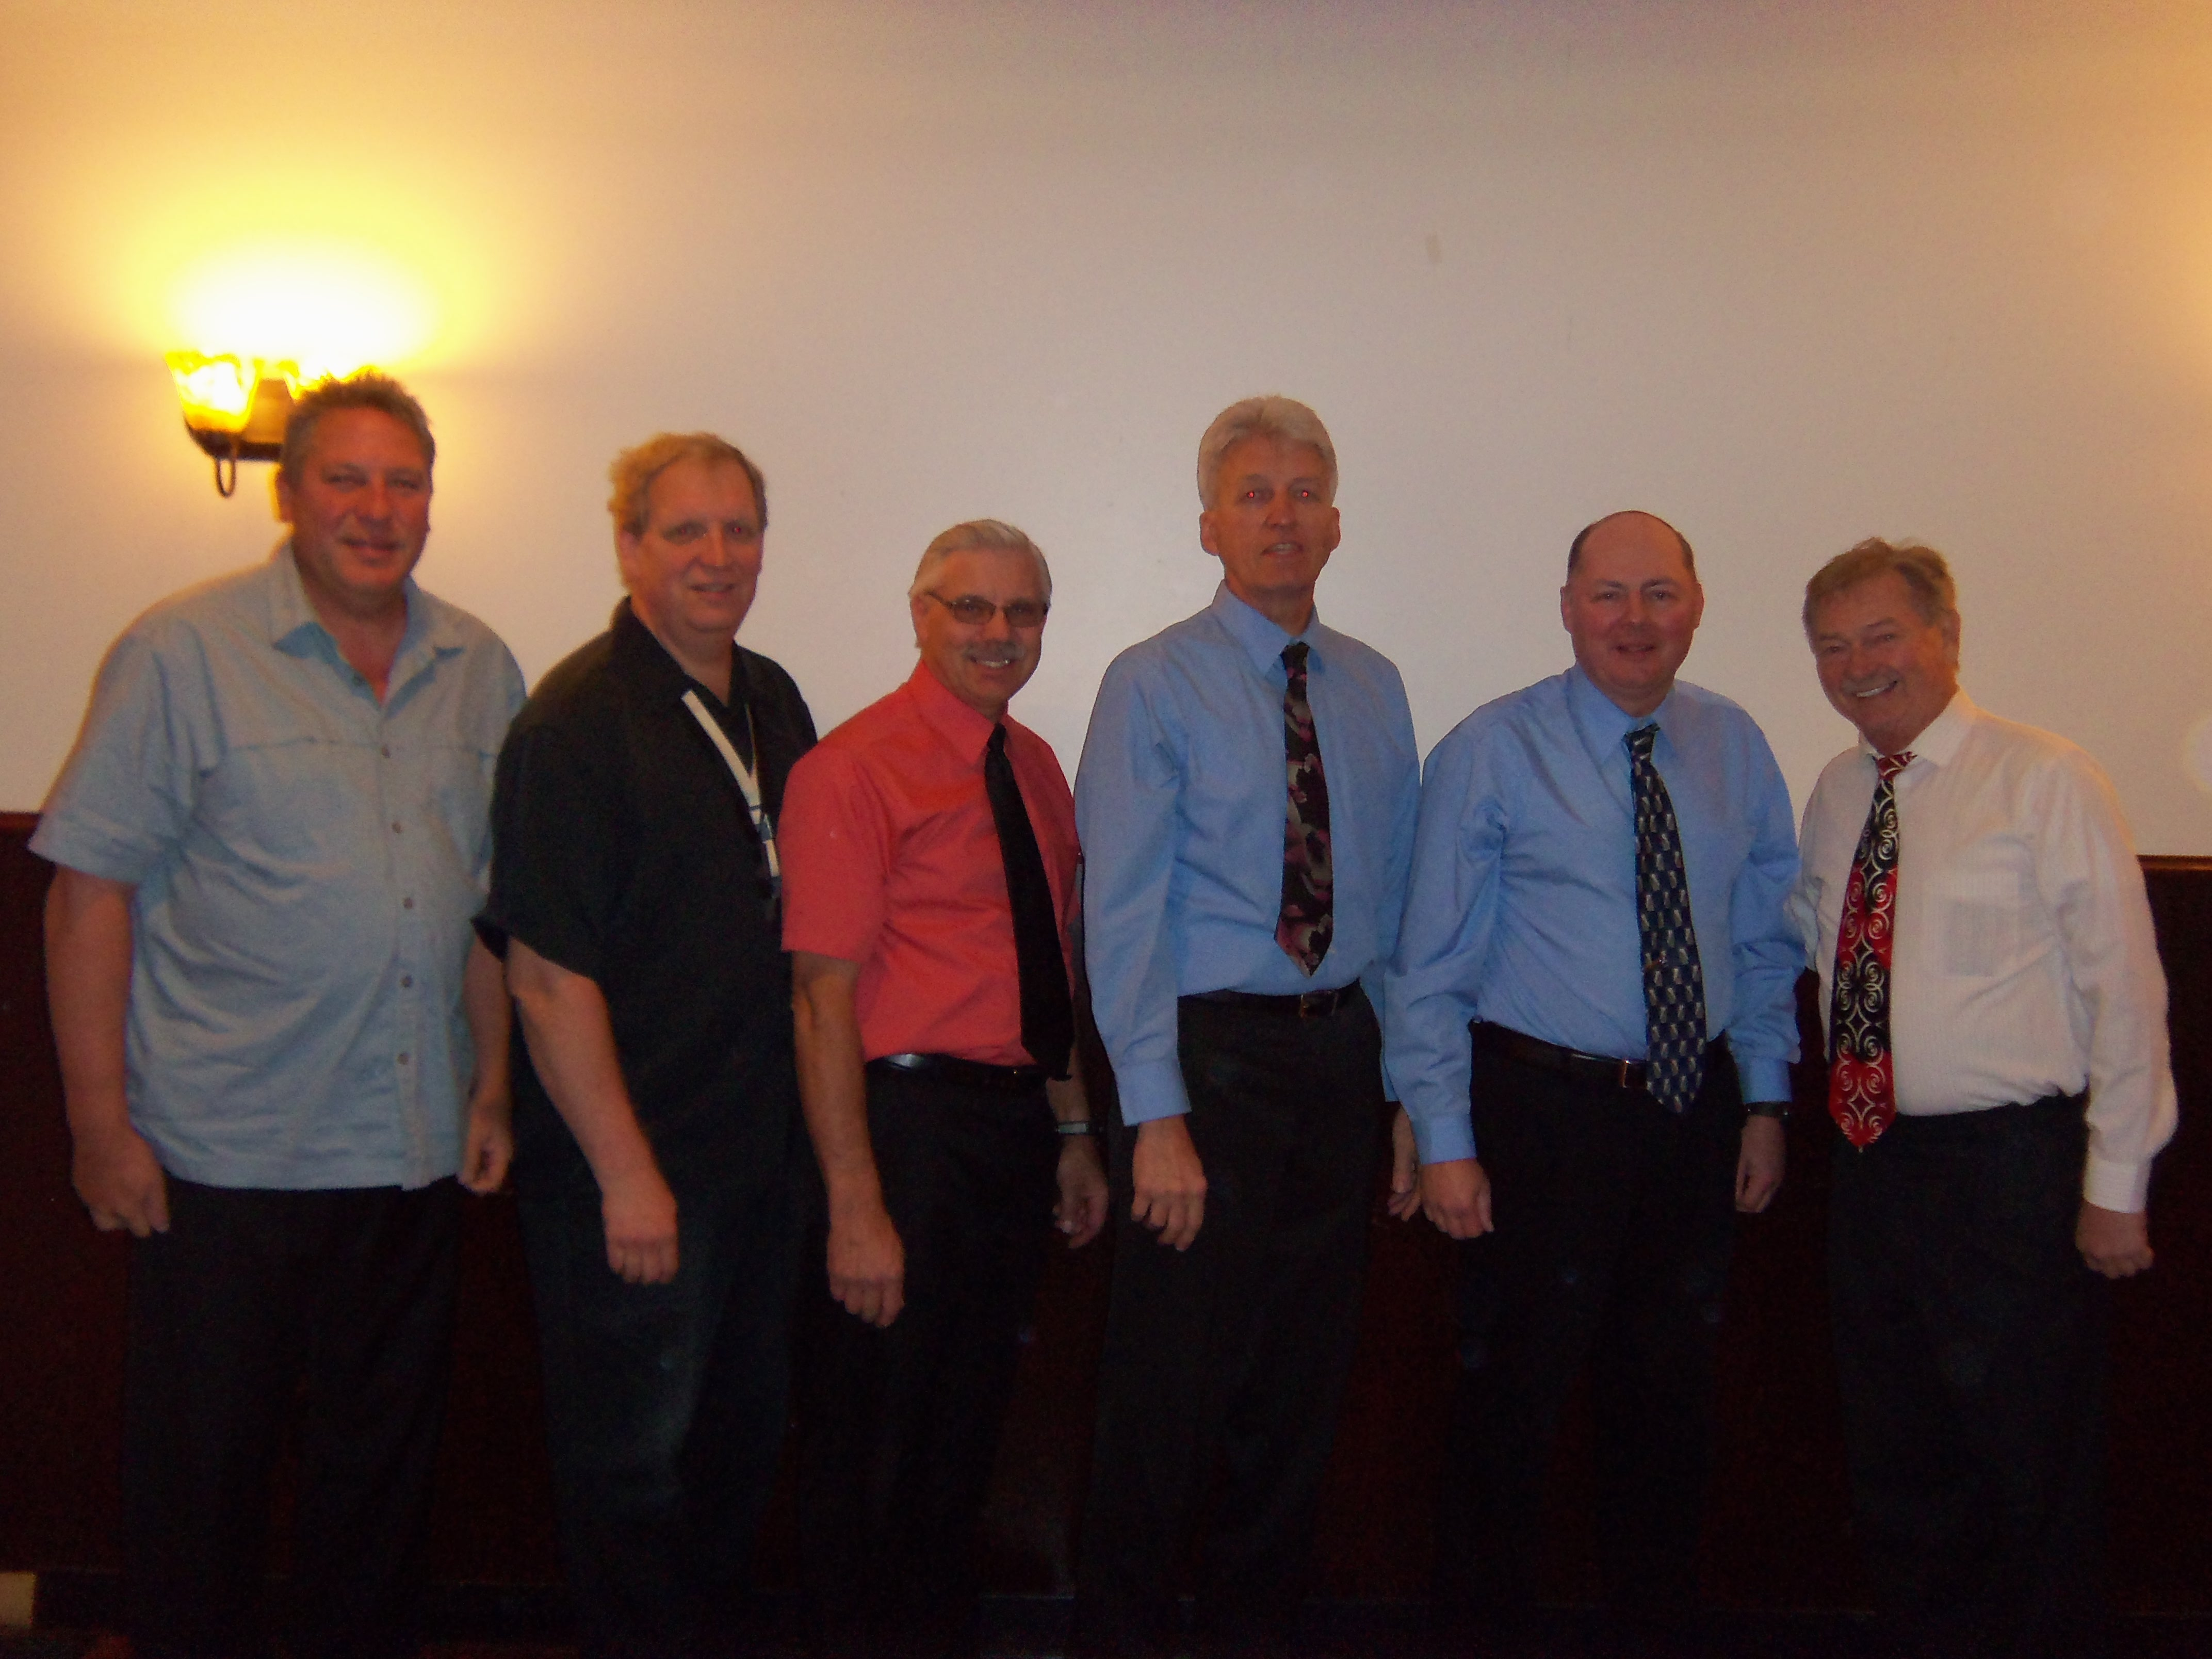 Mike Samborski, Mark Dombrowski, Don Wayerski, Ken Cekosh, Rich Raclawski, Pete Kweck